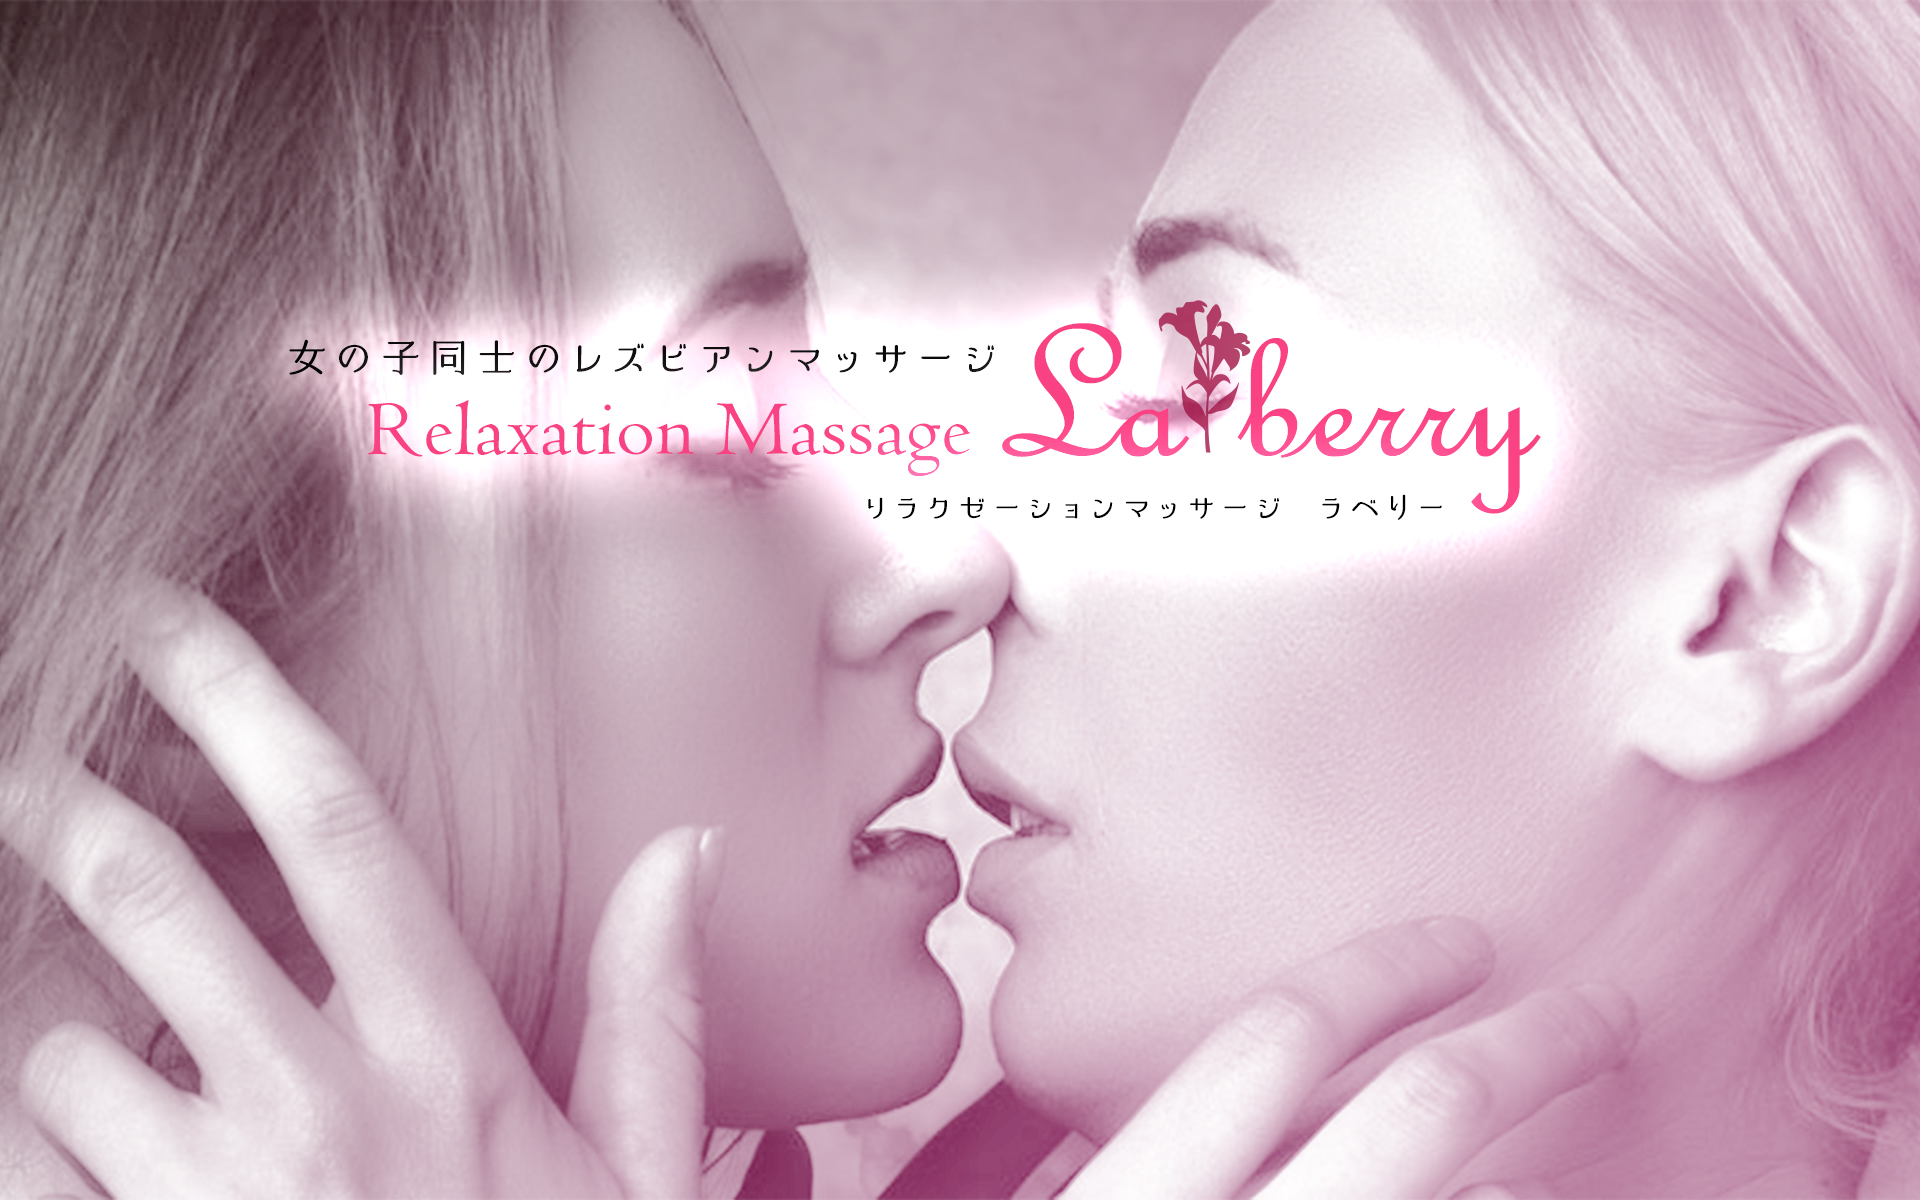 Relaxation Massage La berry ~ラベリー~